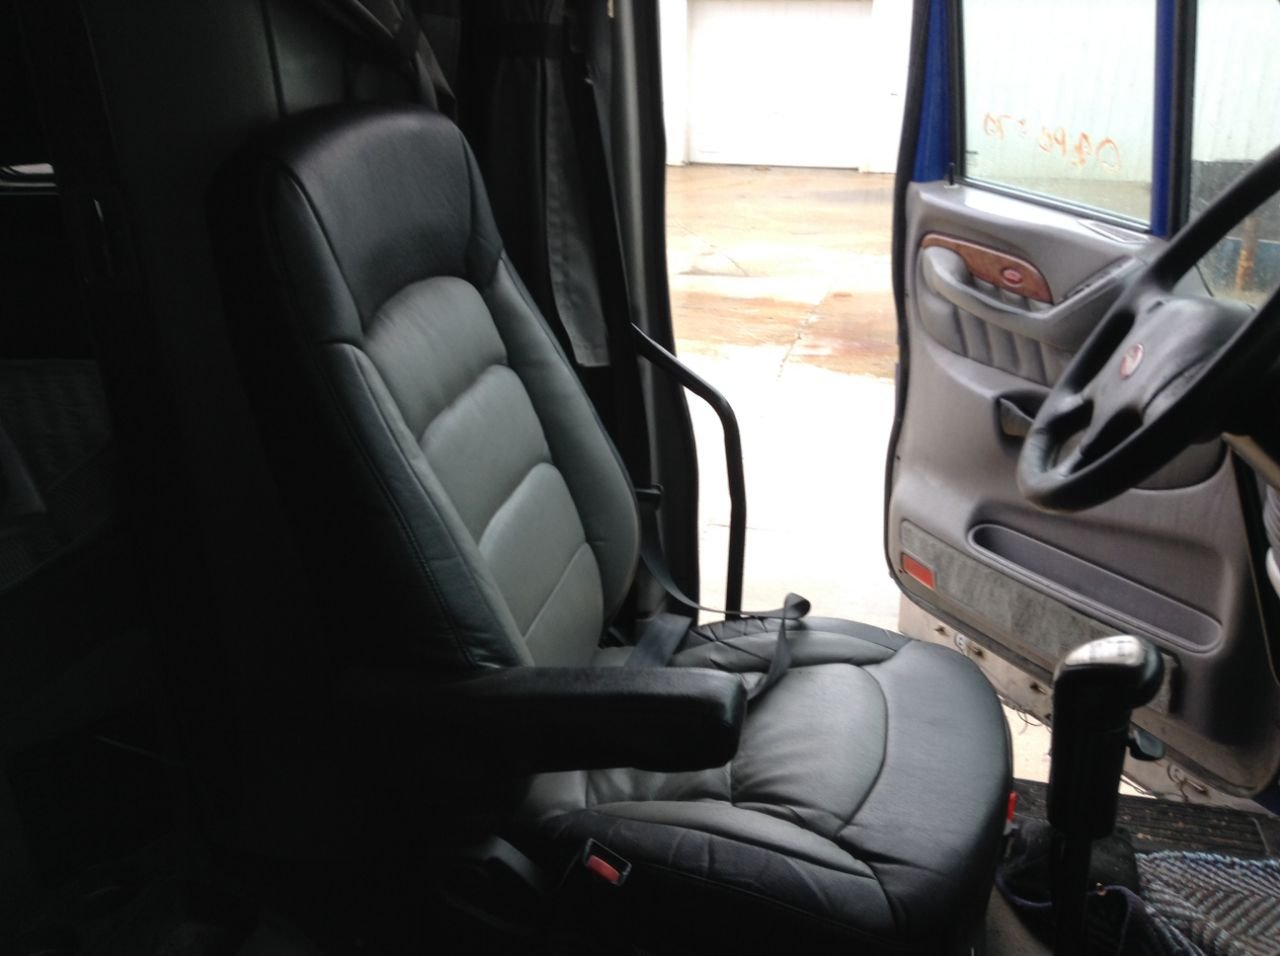 PETERBILT 387 Seat, Air Ride